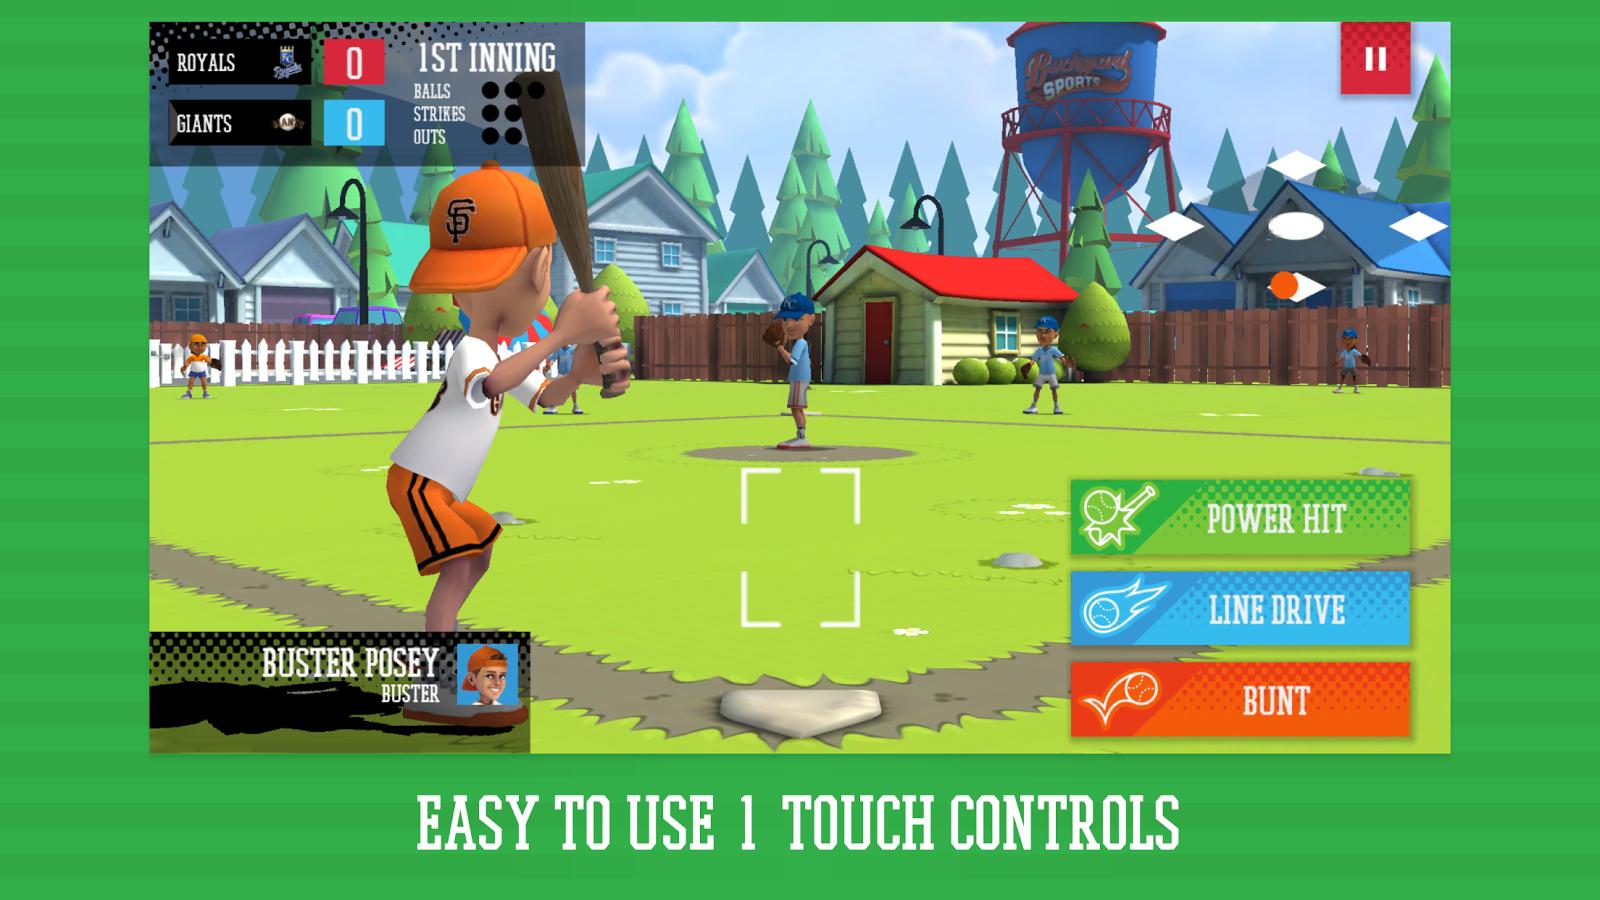 Backyard Sports Download backyard sports baseball 2015 1.50.0 apk download - android sports games